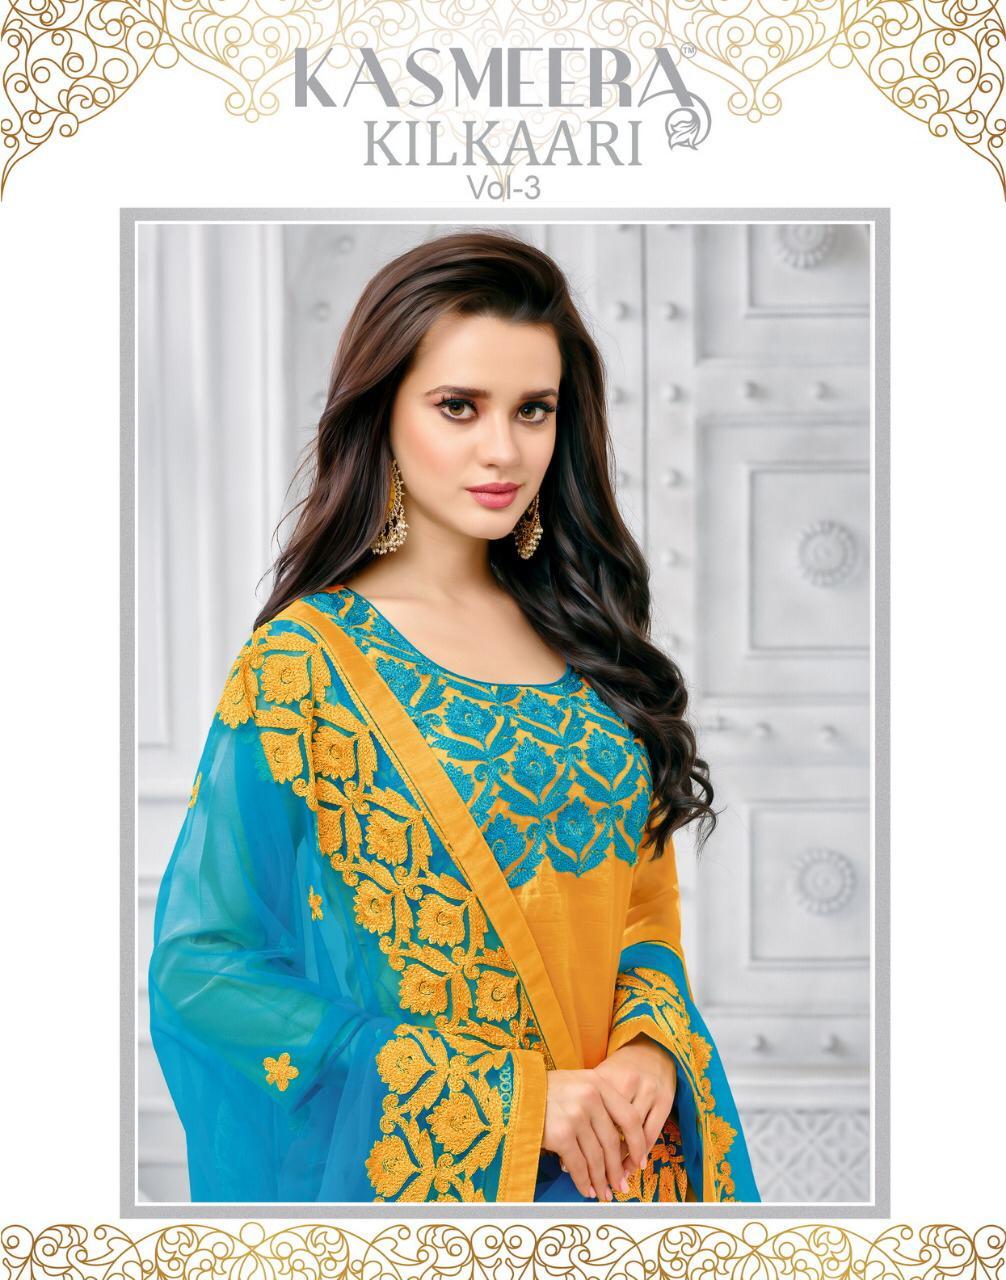 kashmeera killkari vol 3 colorful casual wear suits catalog at reasonable rate